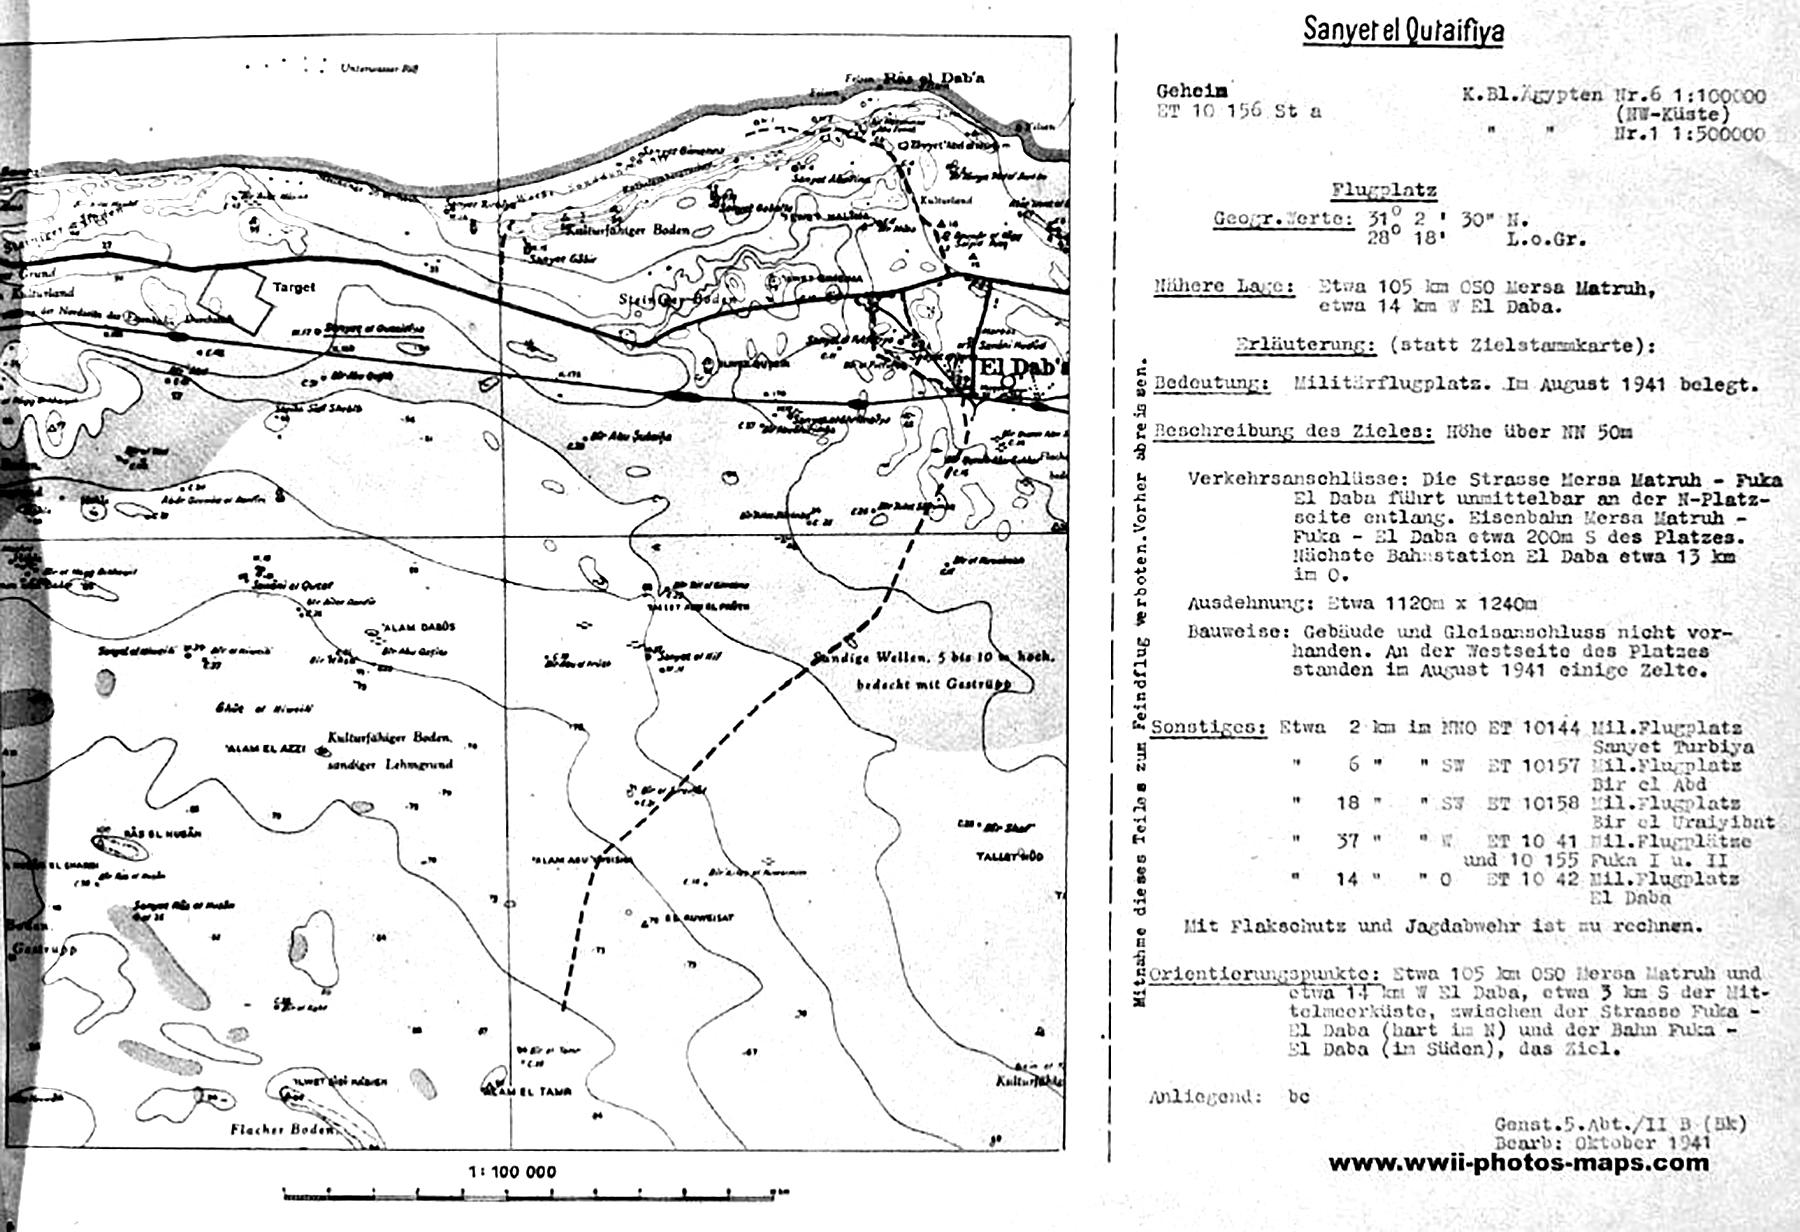 Artwork showing a map of the WWII aerodrome at Sanyet el Qutaifiya Flugplatz 1941 01